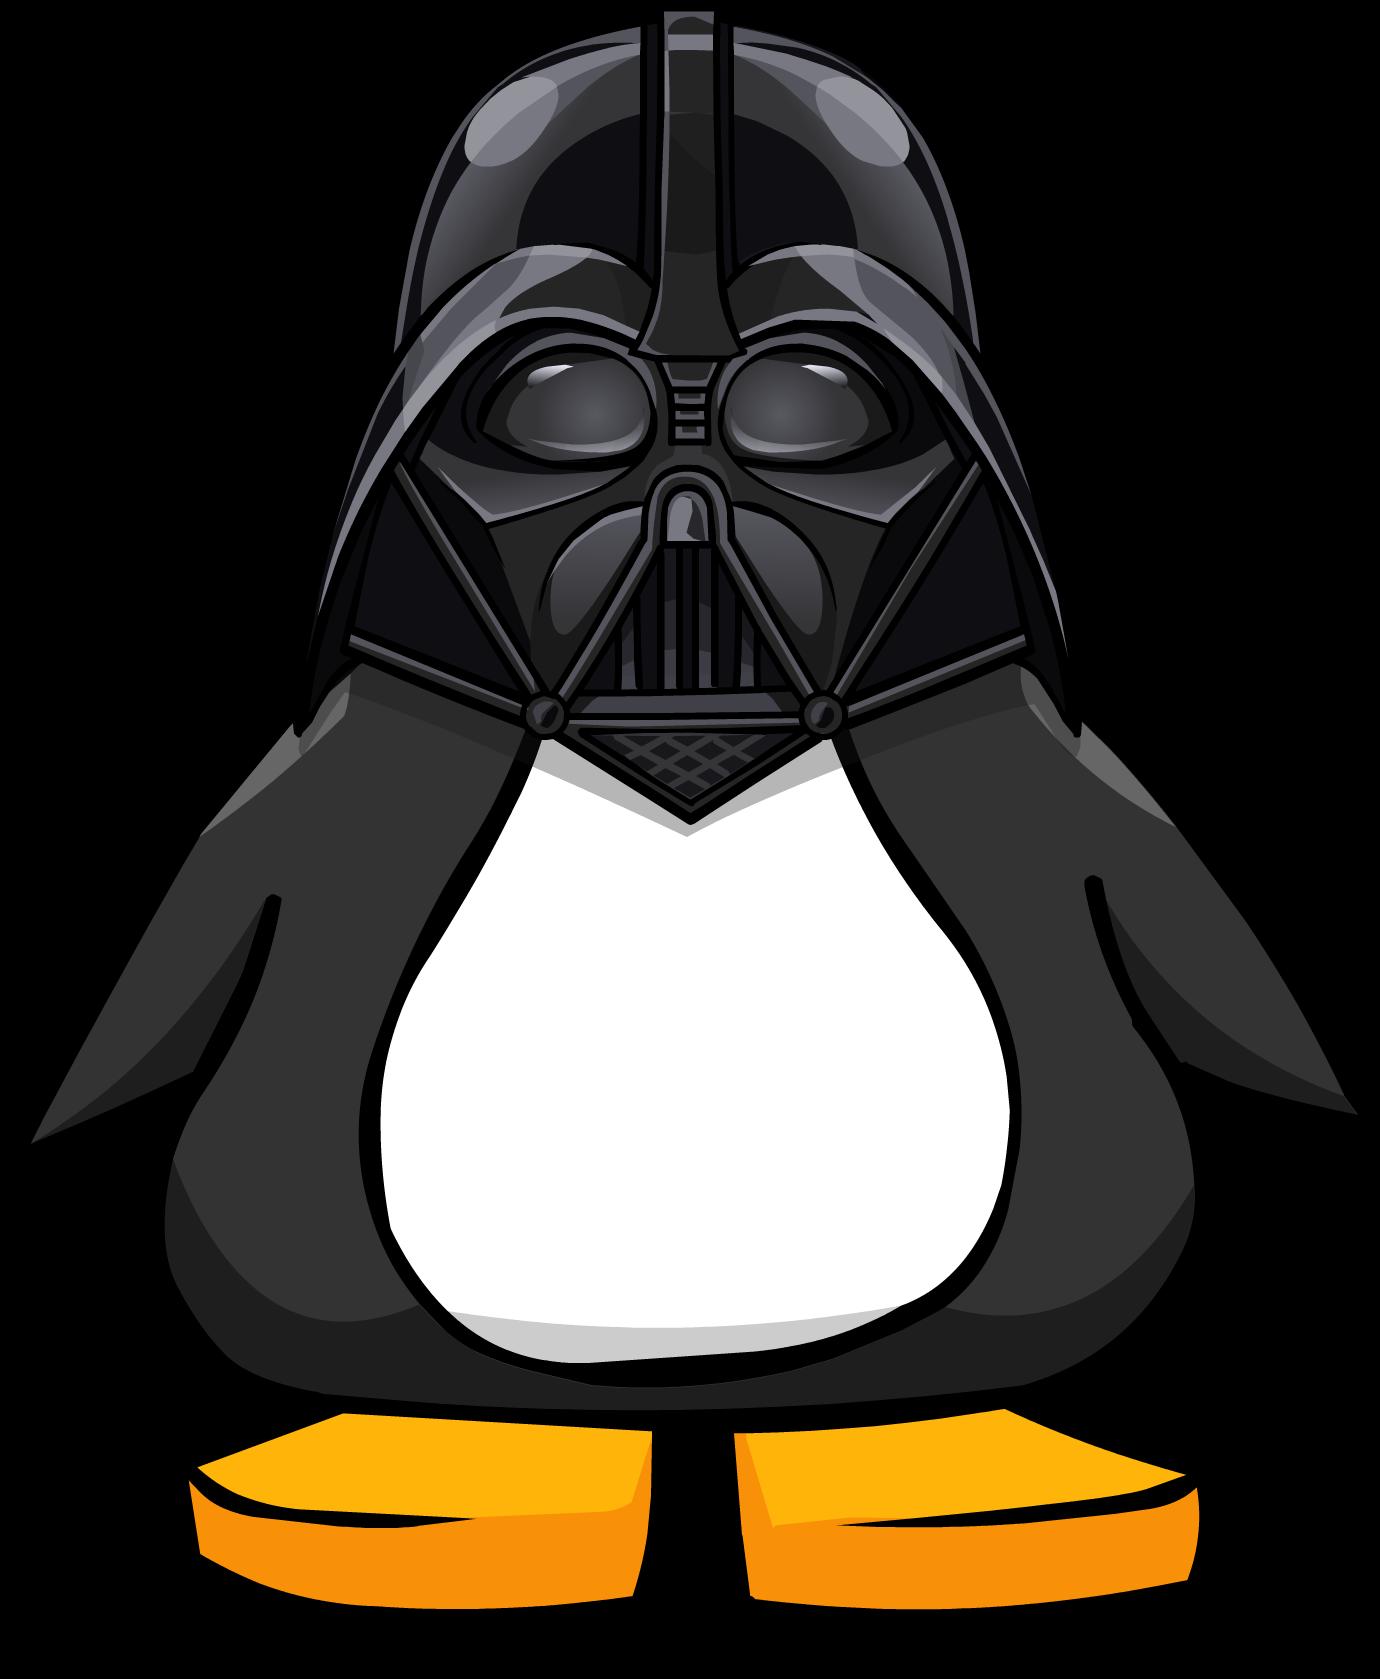 Darth Vader Helmet Club Penguin Wiki Fandom Powered By Wikia